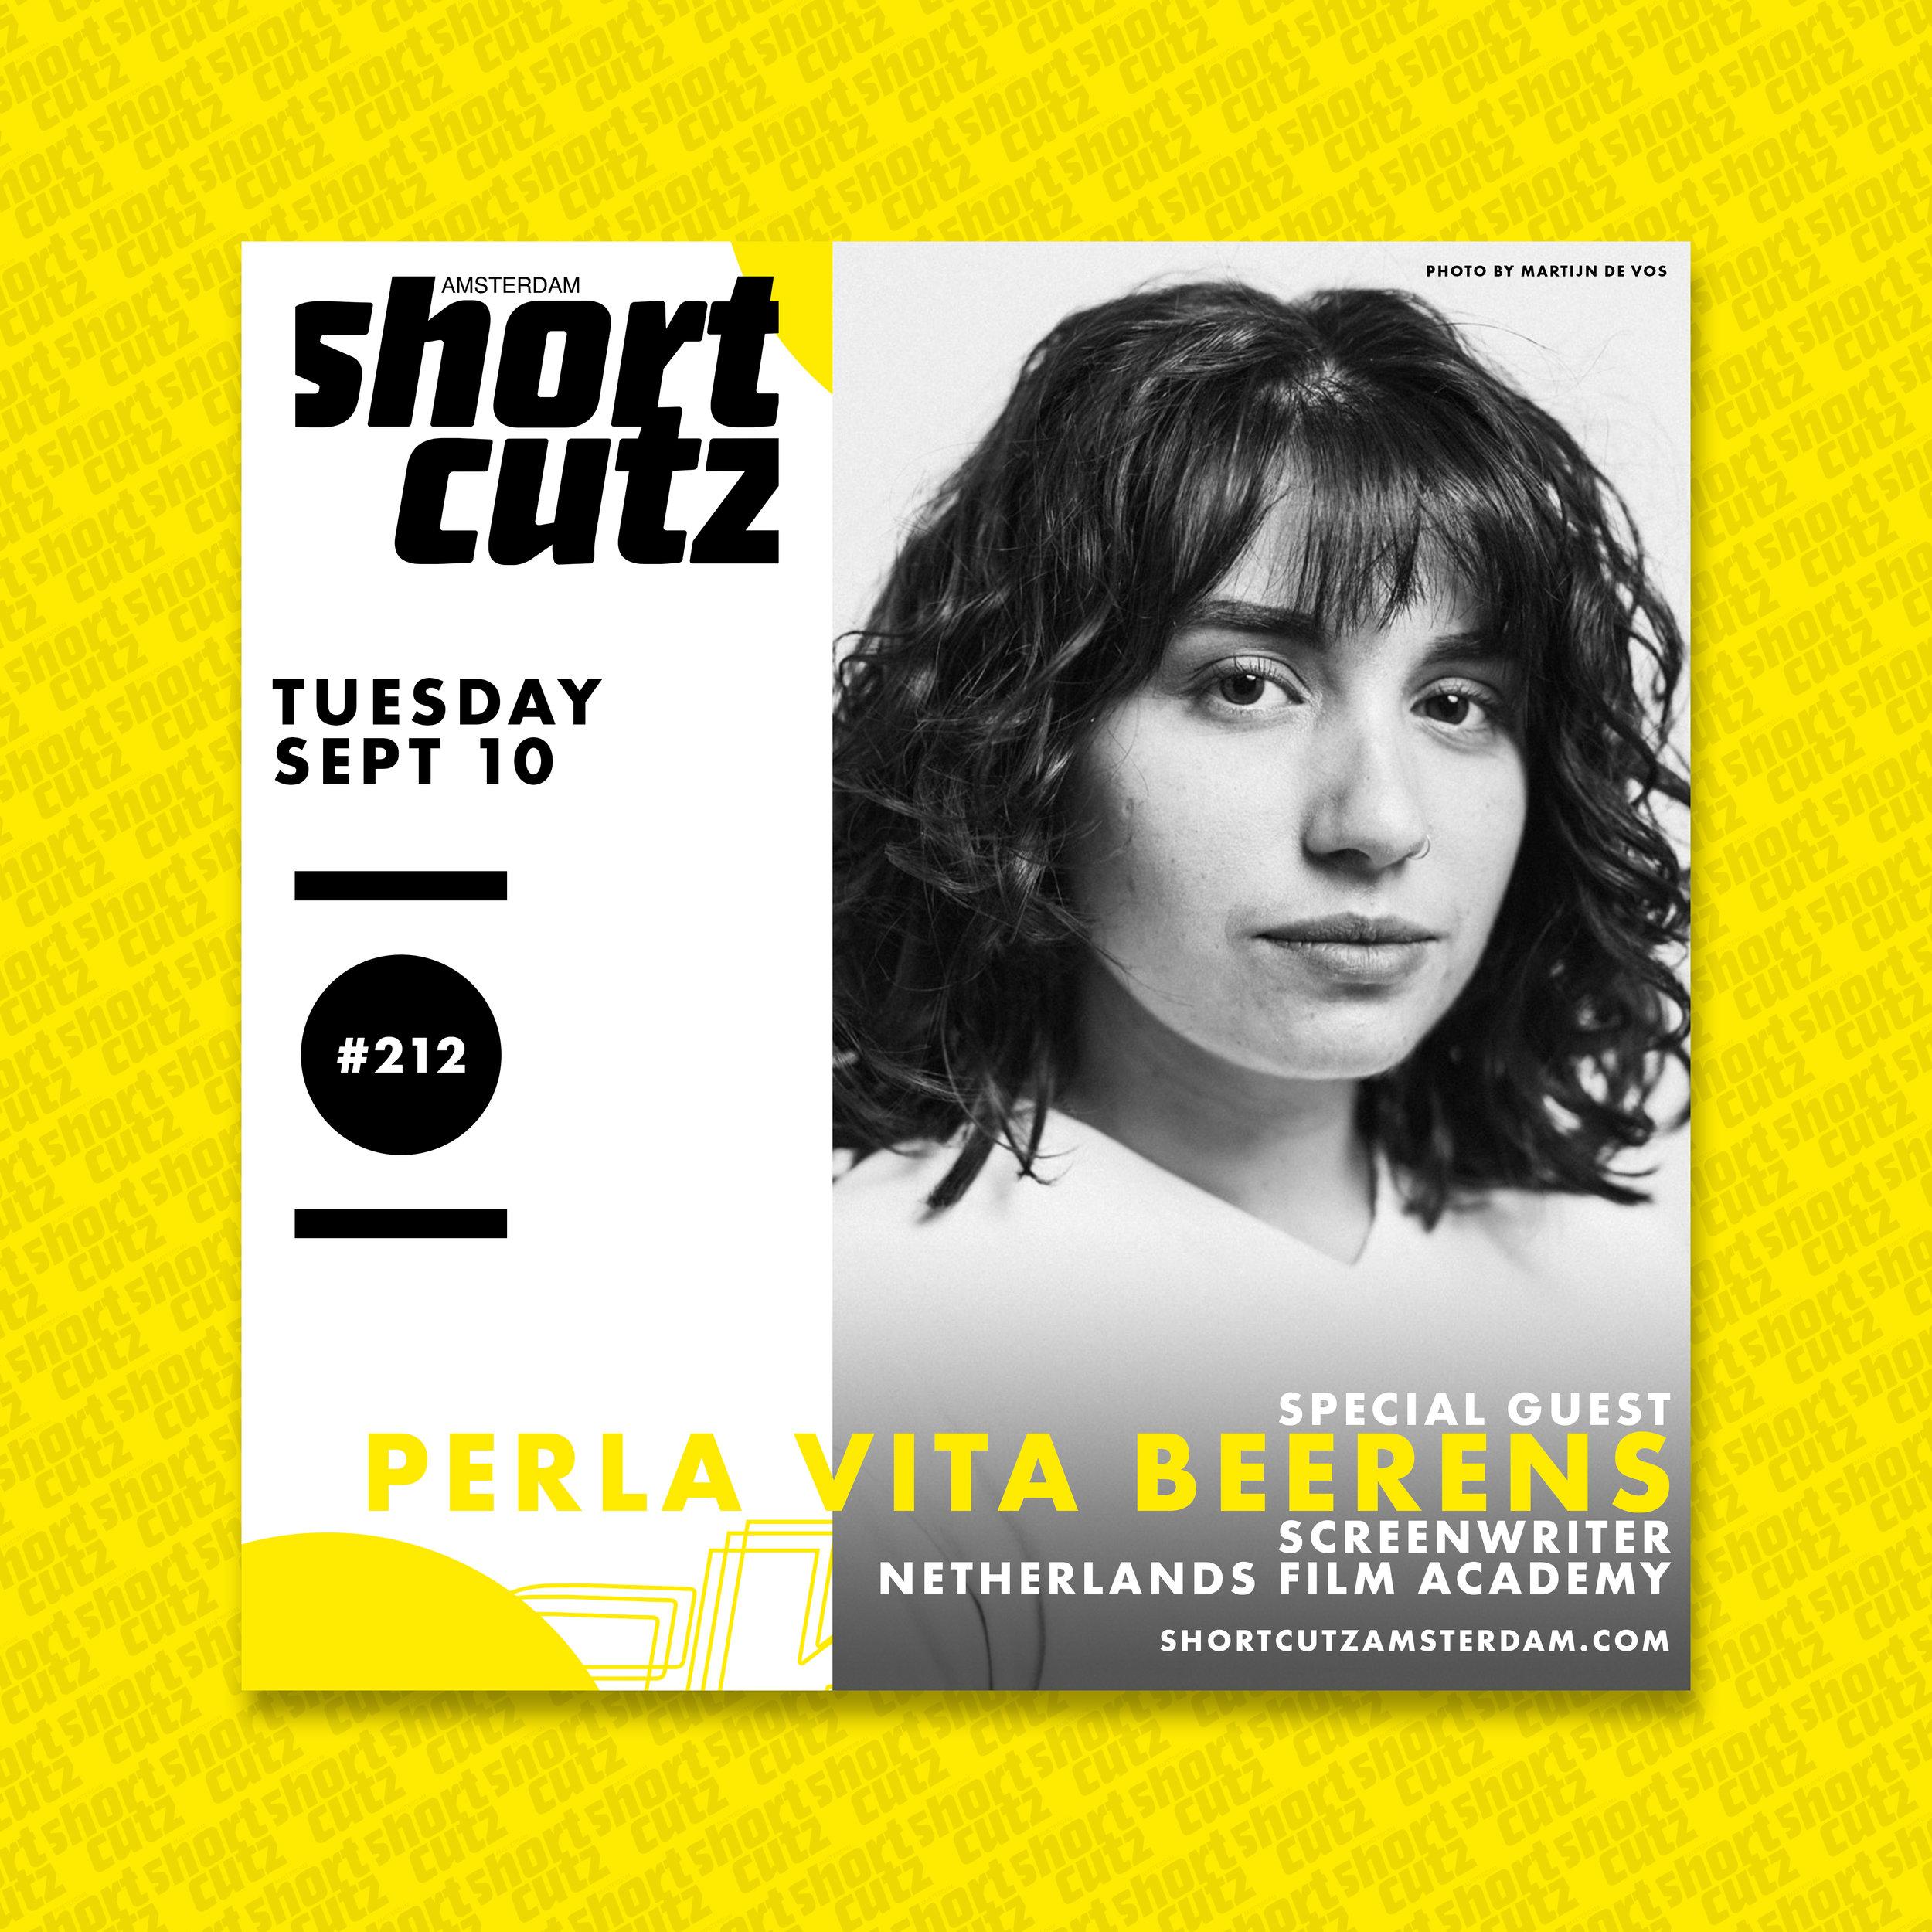 #212 Poster Perla Vita Beerens.jpg